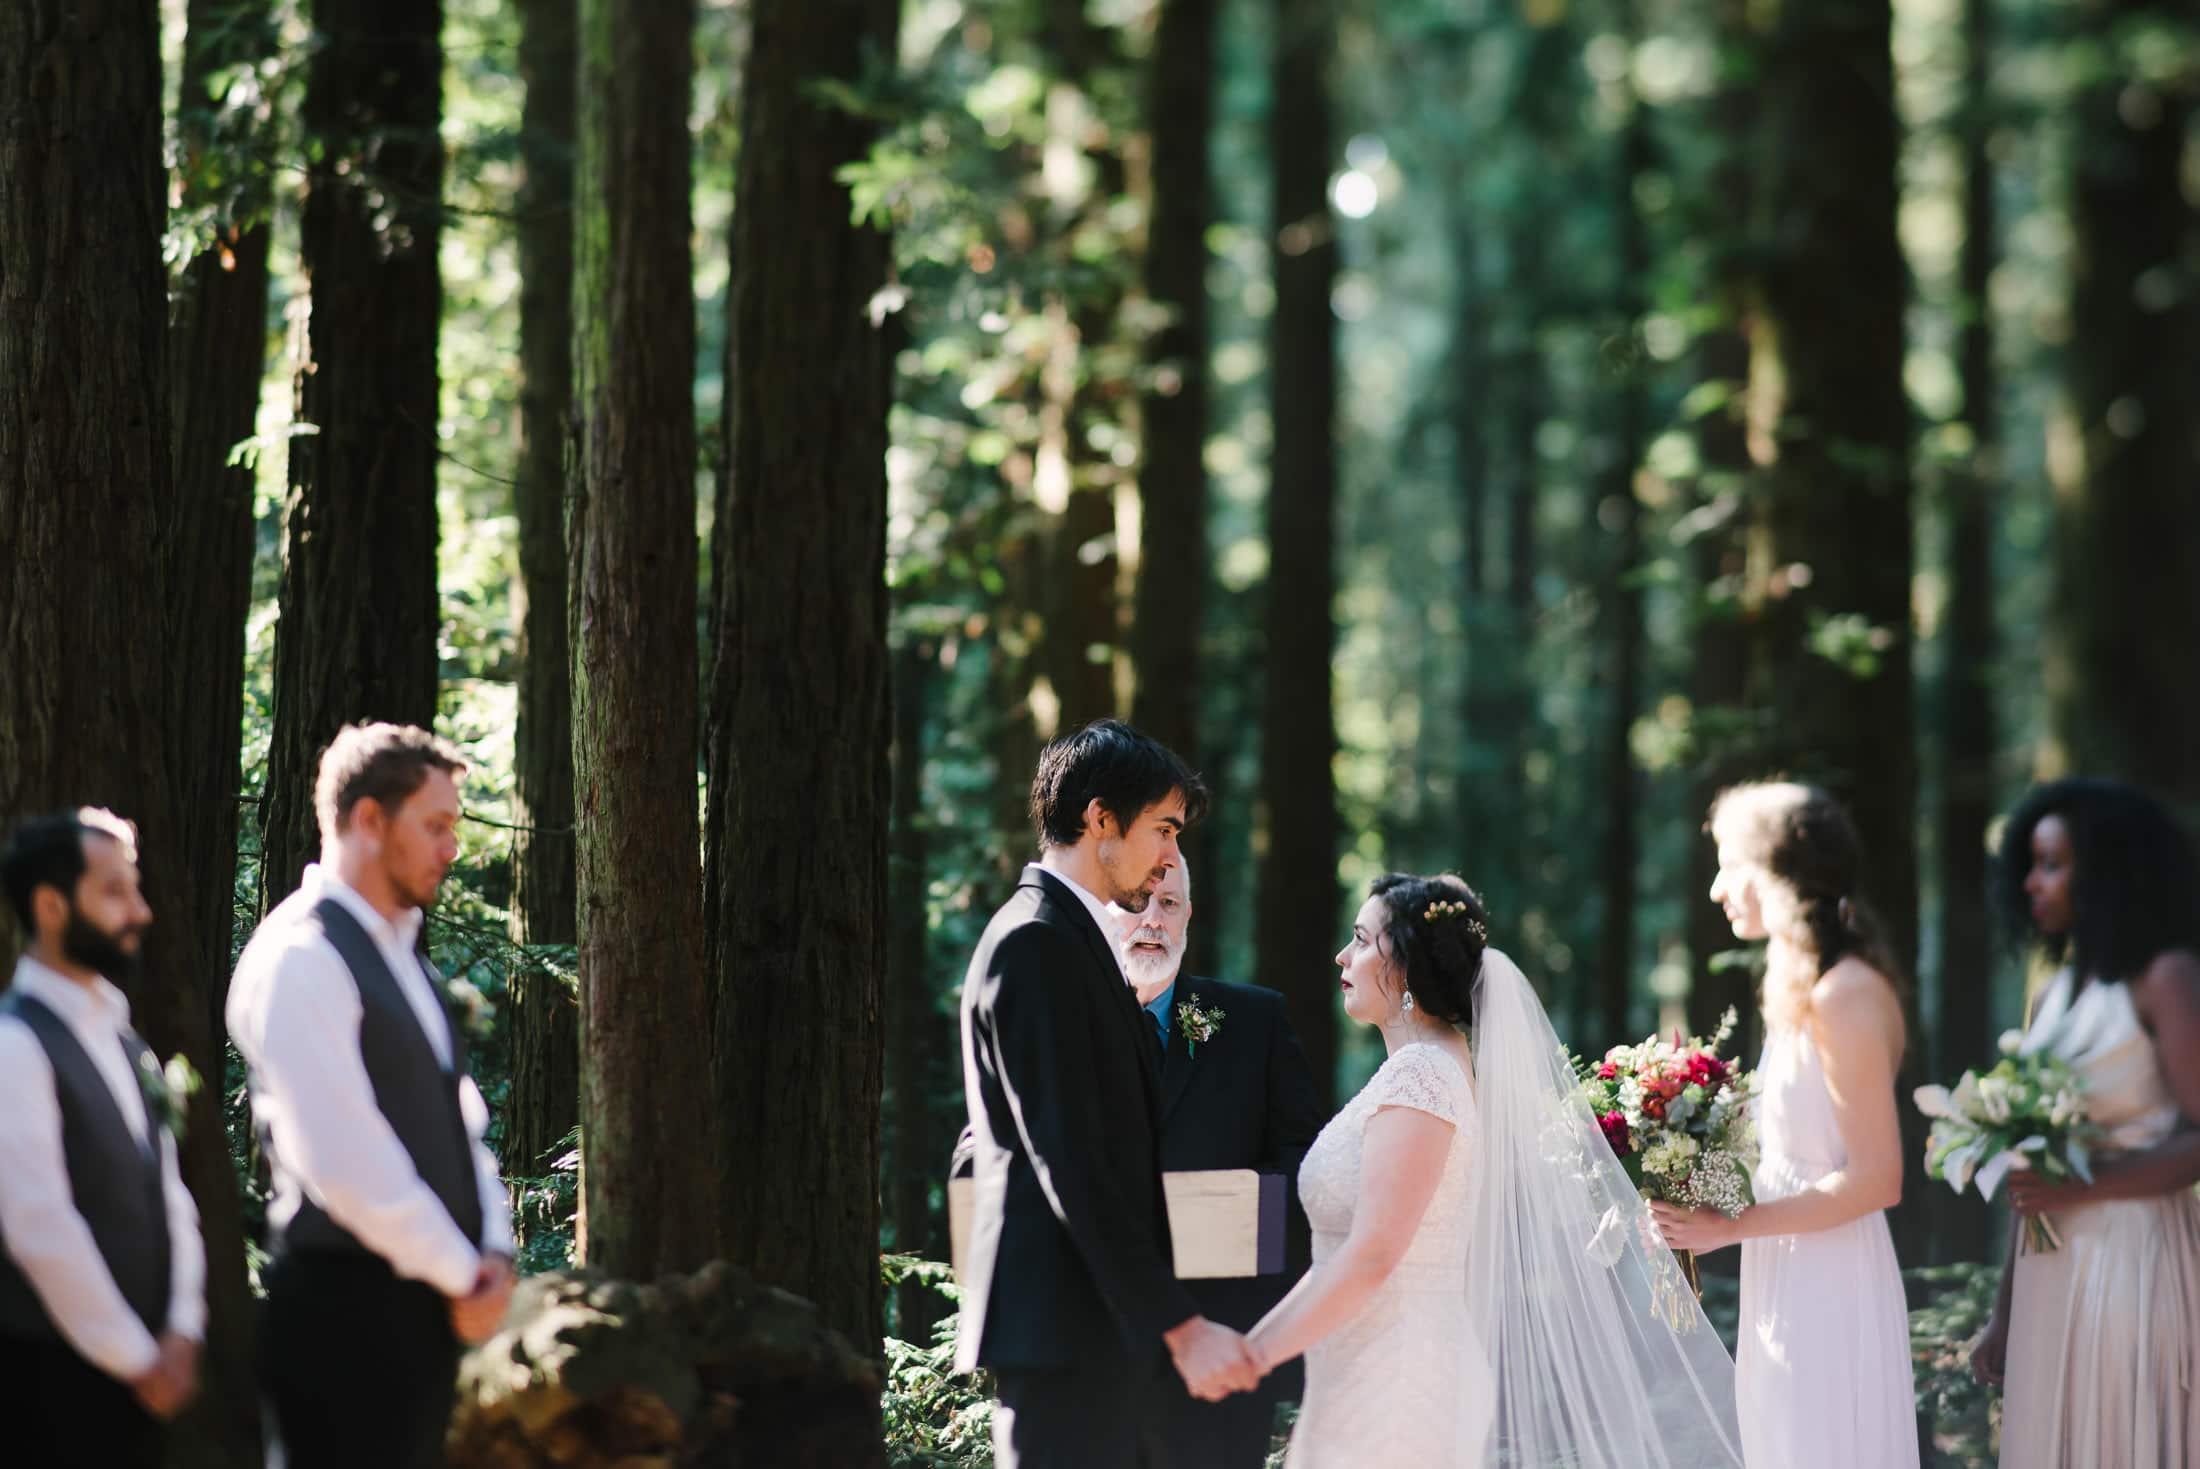 Robert's Regional Park wedding ceremony